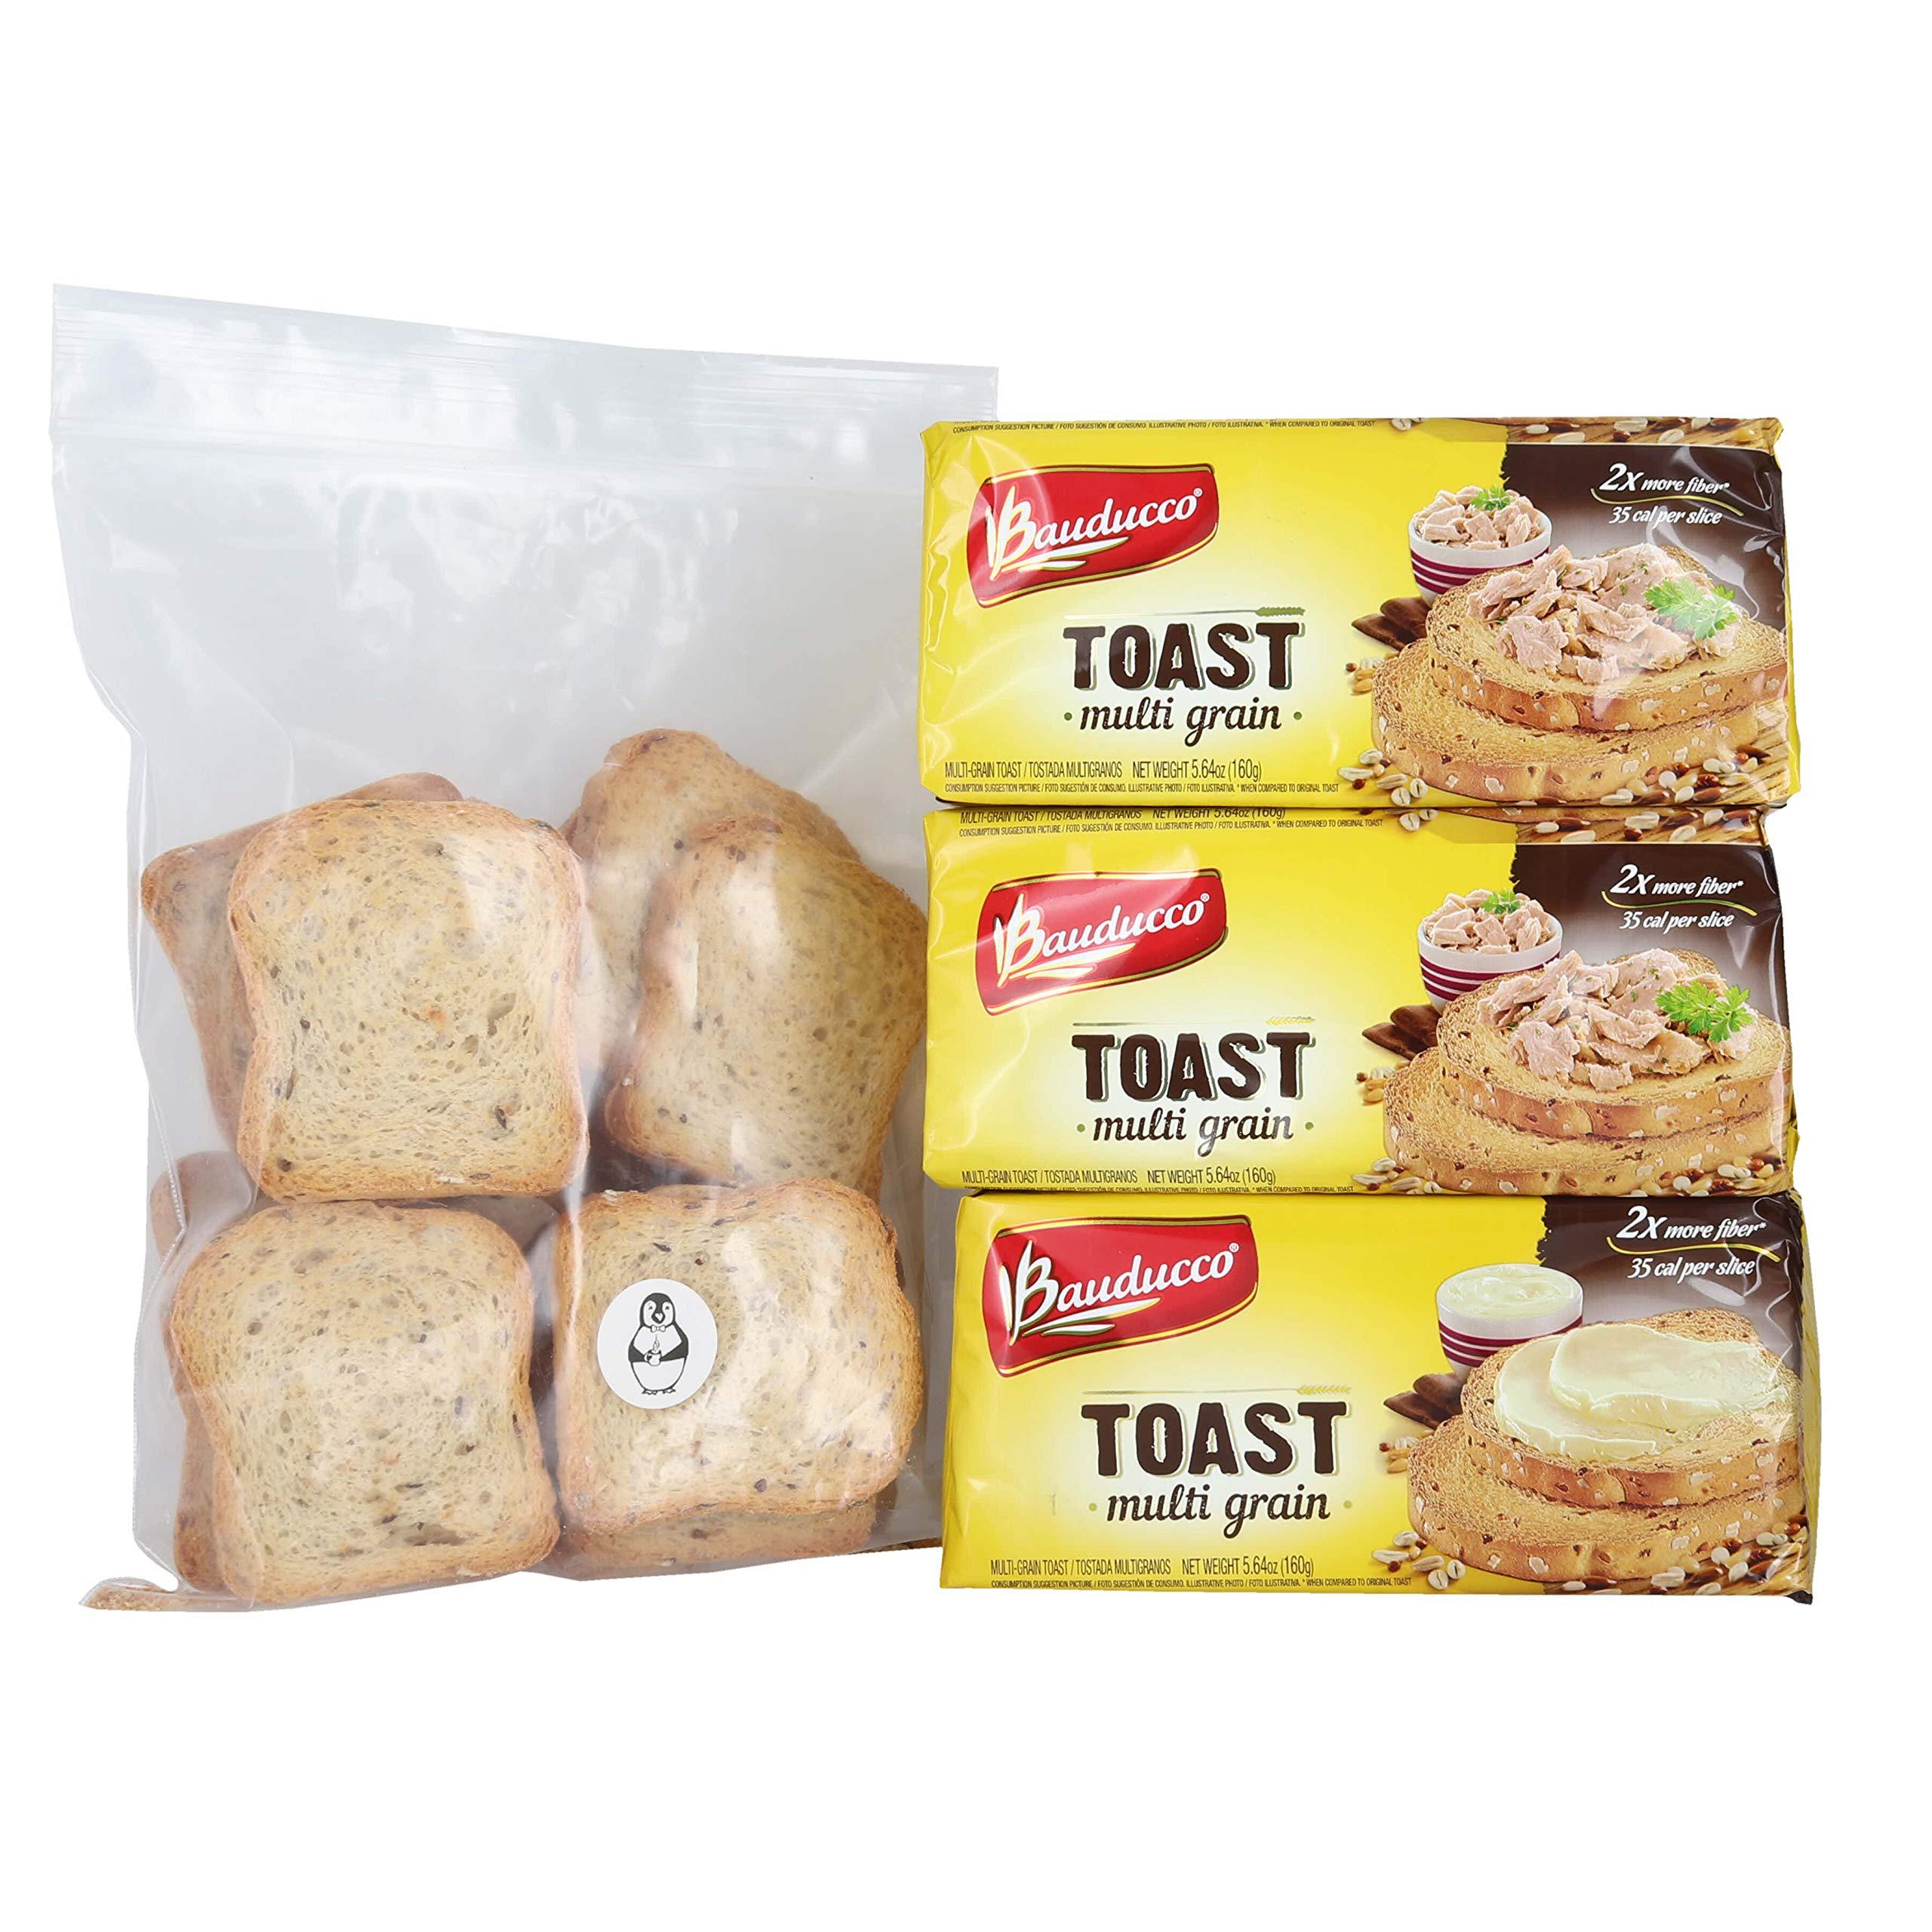 Bauducco Multi Grain Toast - (3 Pack) W/ Premium Penguin Quick Storage Pouch by Bauducco